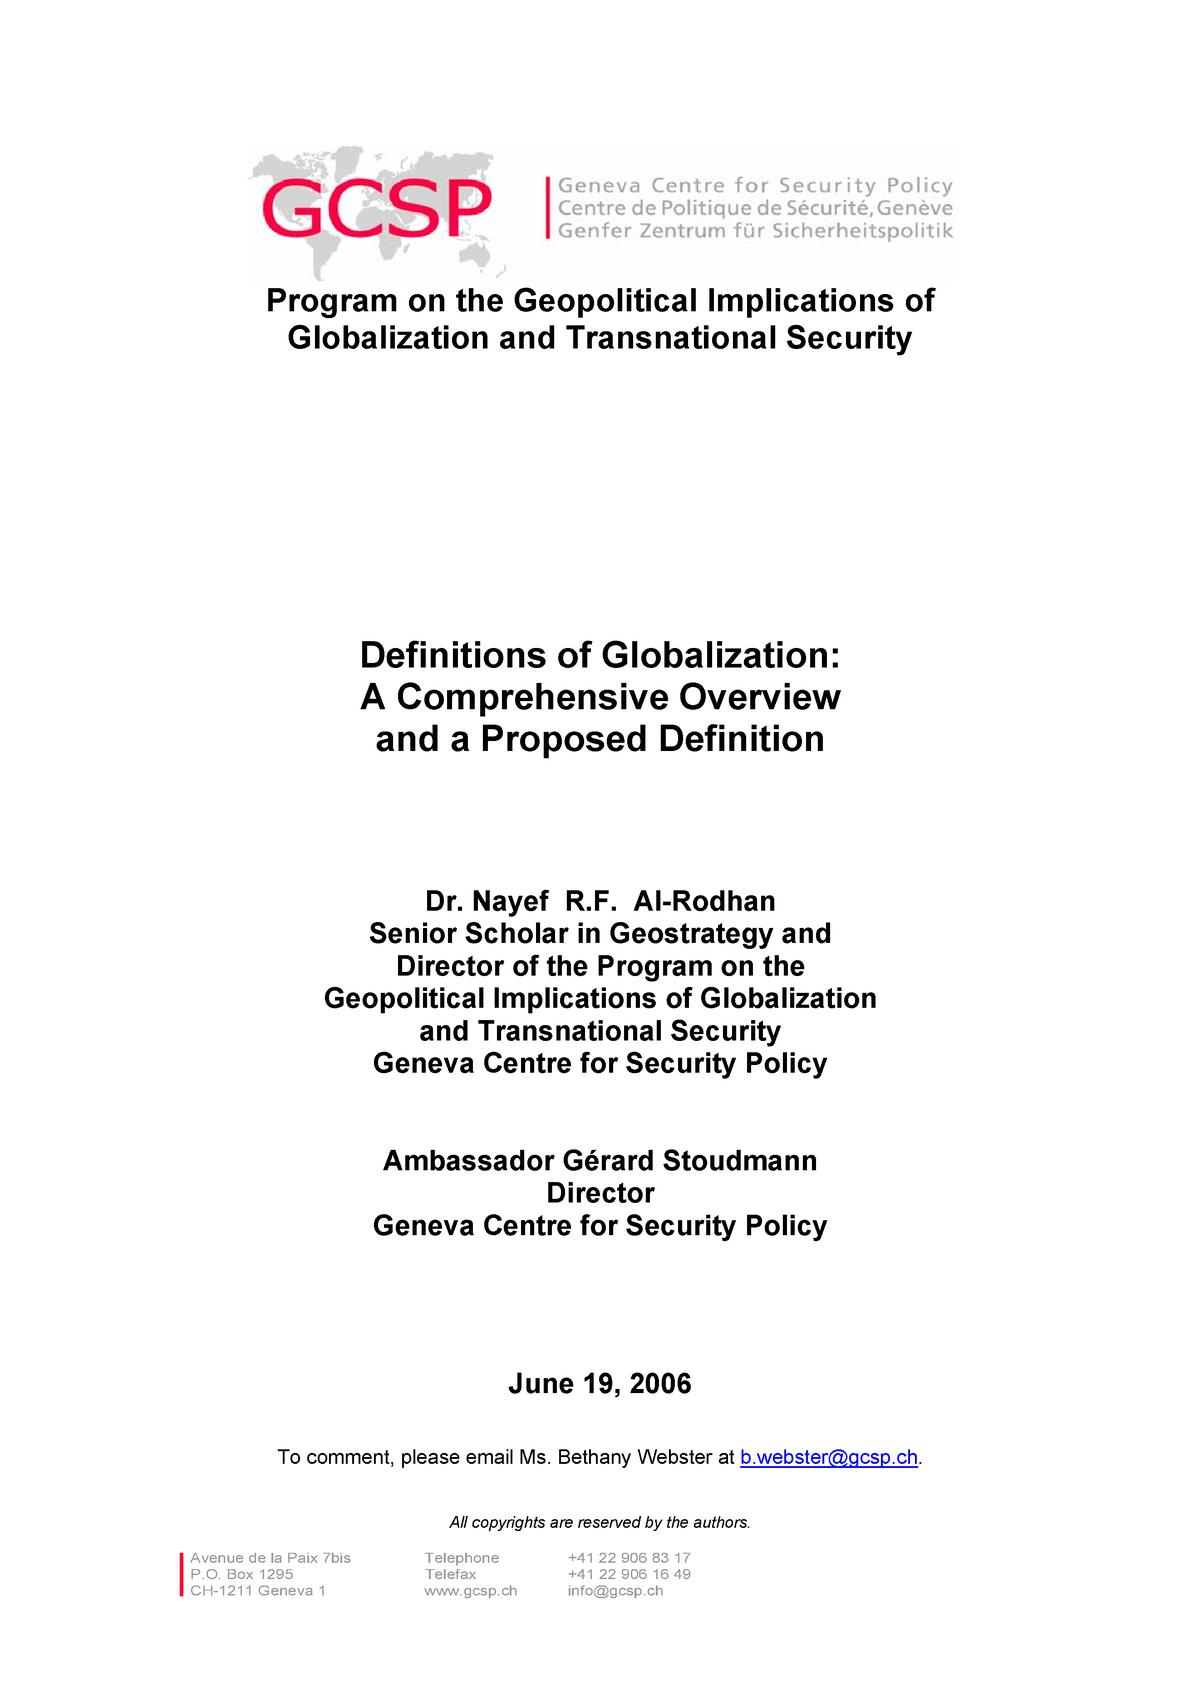 beste Qualität Outlet-Store Beamten wählen Definitions of Globalization - A Comprehensive Overview and ...